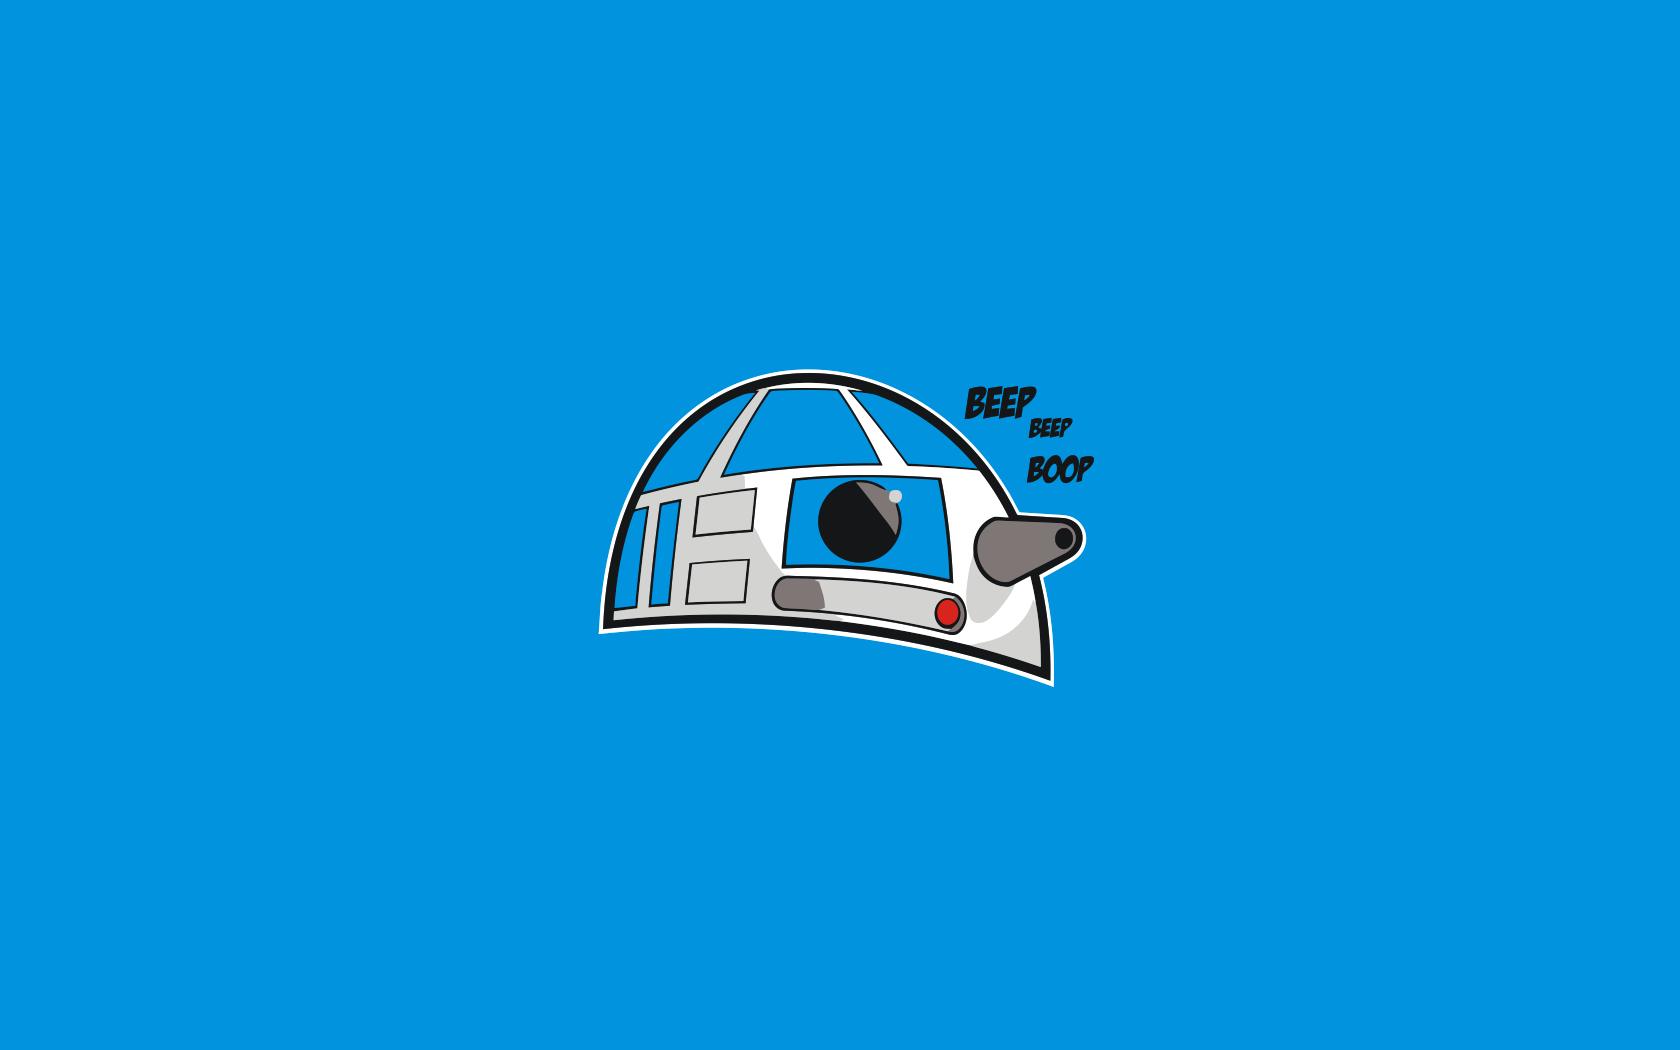 Wallpaper Illustration Star Wars Logo Cartoon R2 D2 Brand Font Football Equipment And Supplies 1680x1050 Defalt 147191 Hd Wallpapers Wallhere